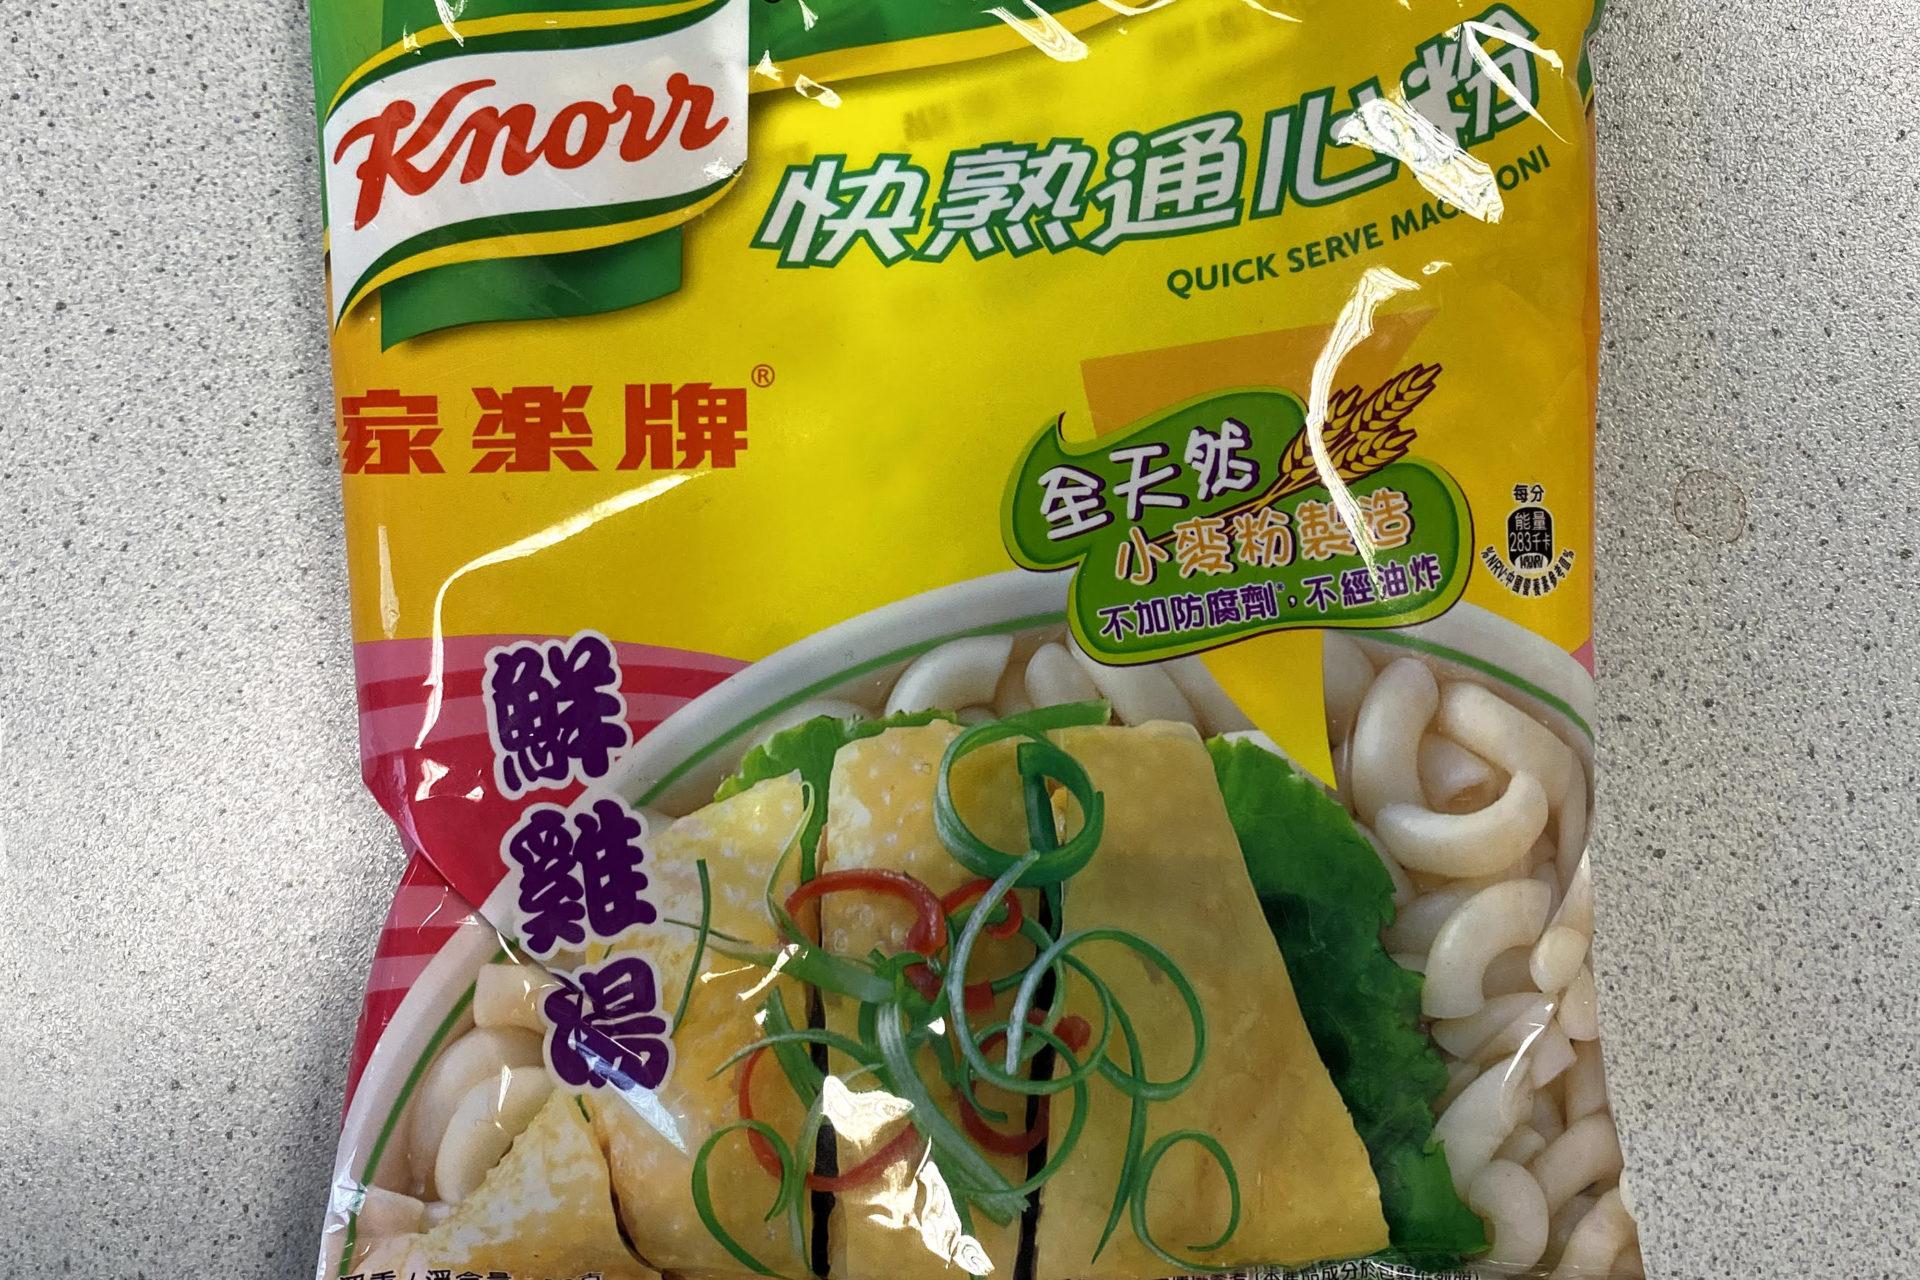 "#1750: Knorr Quick Serve Macaroni ""Wonton Flavour"""